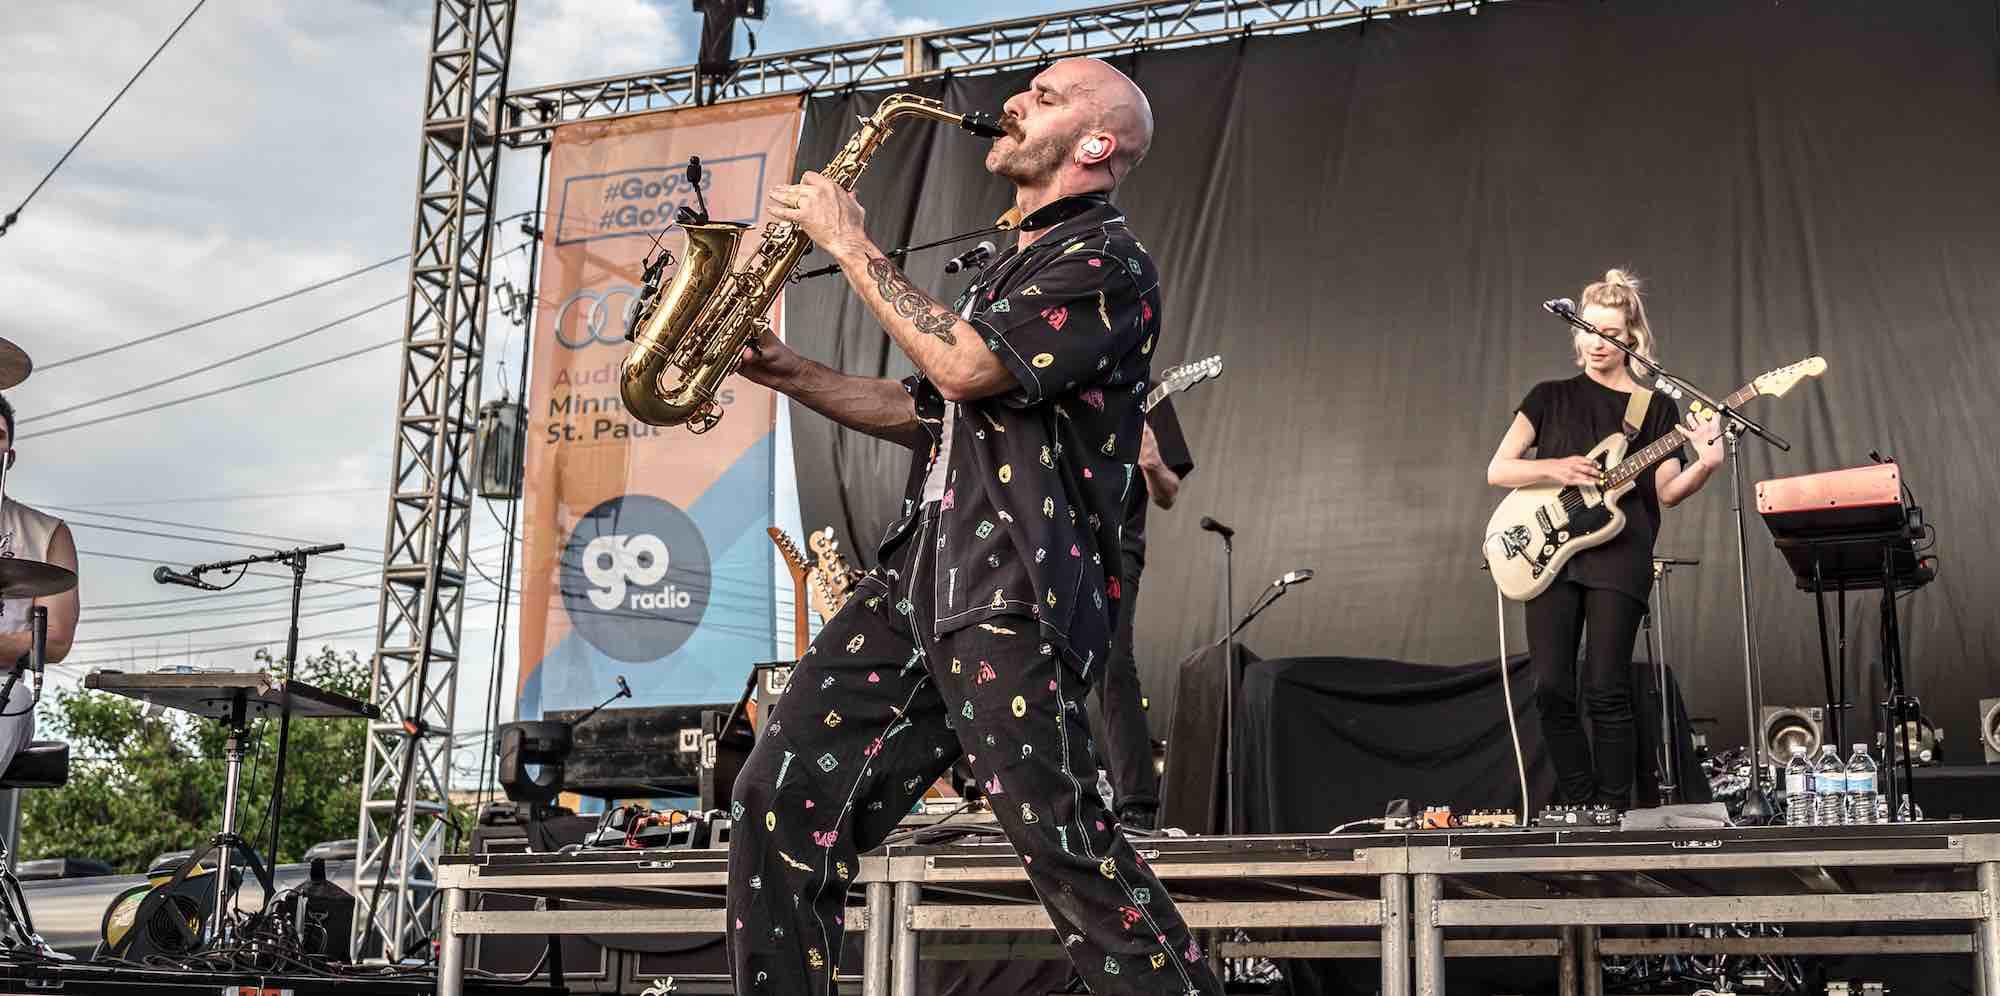 Go Fest 19 Go 96.3 Go Radio Minneapolis, Minnesota Alan Rayman X Ambassadors Wild Belle Catfish and the Bottlemen The Cabooze June 28, 2019